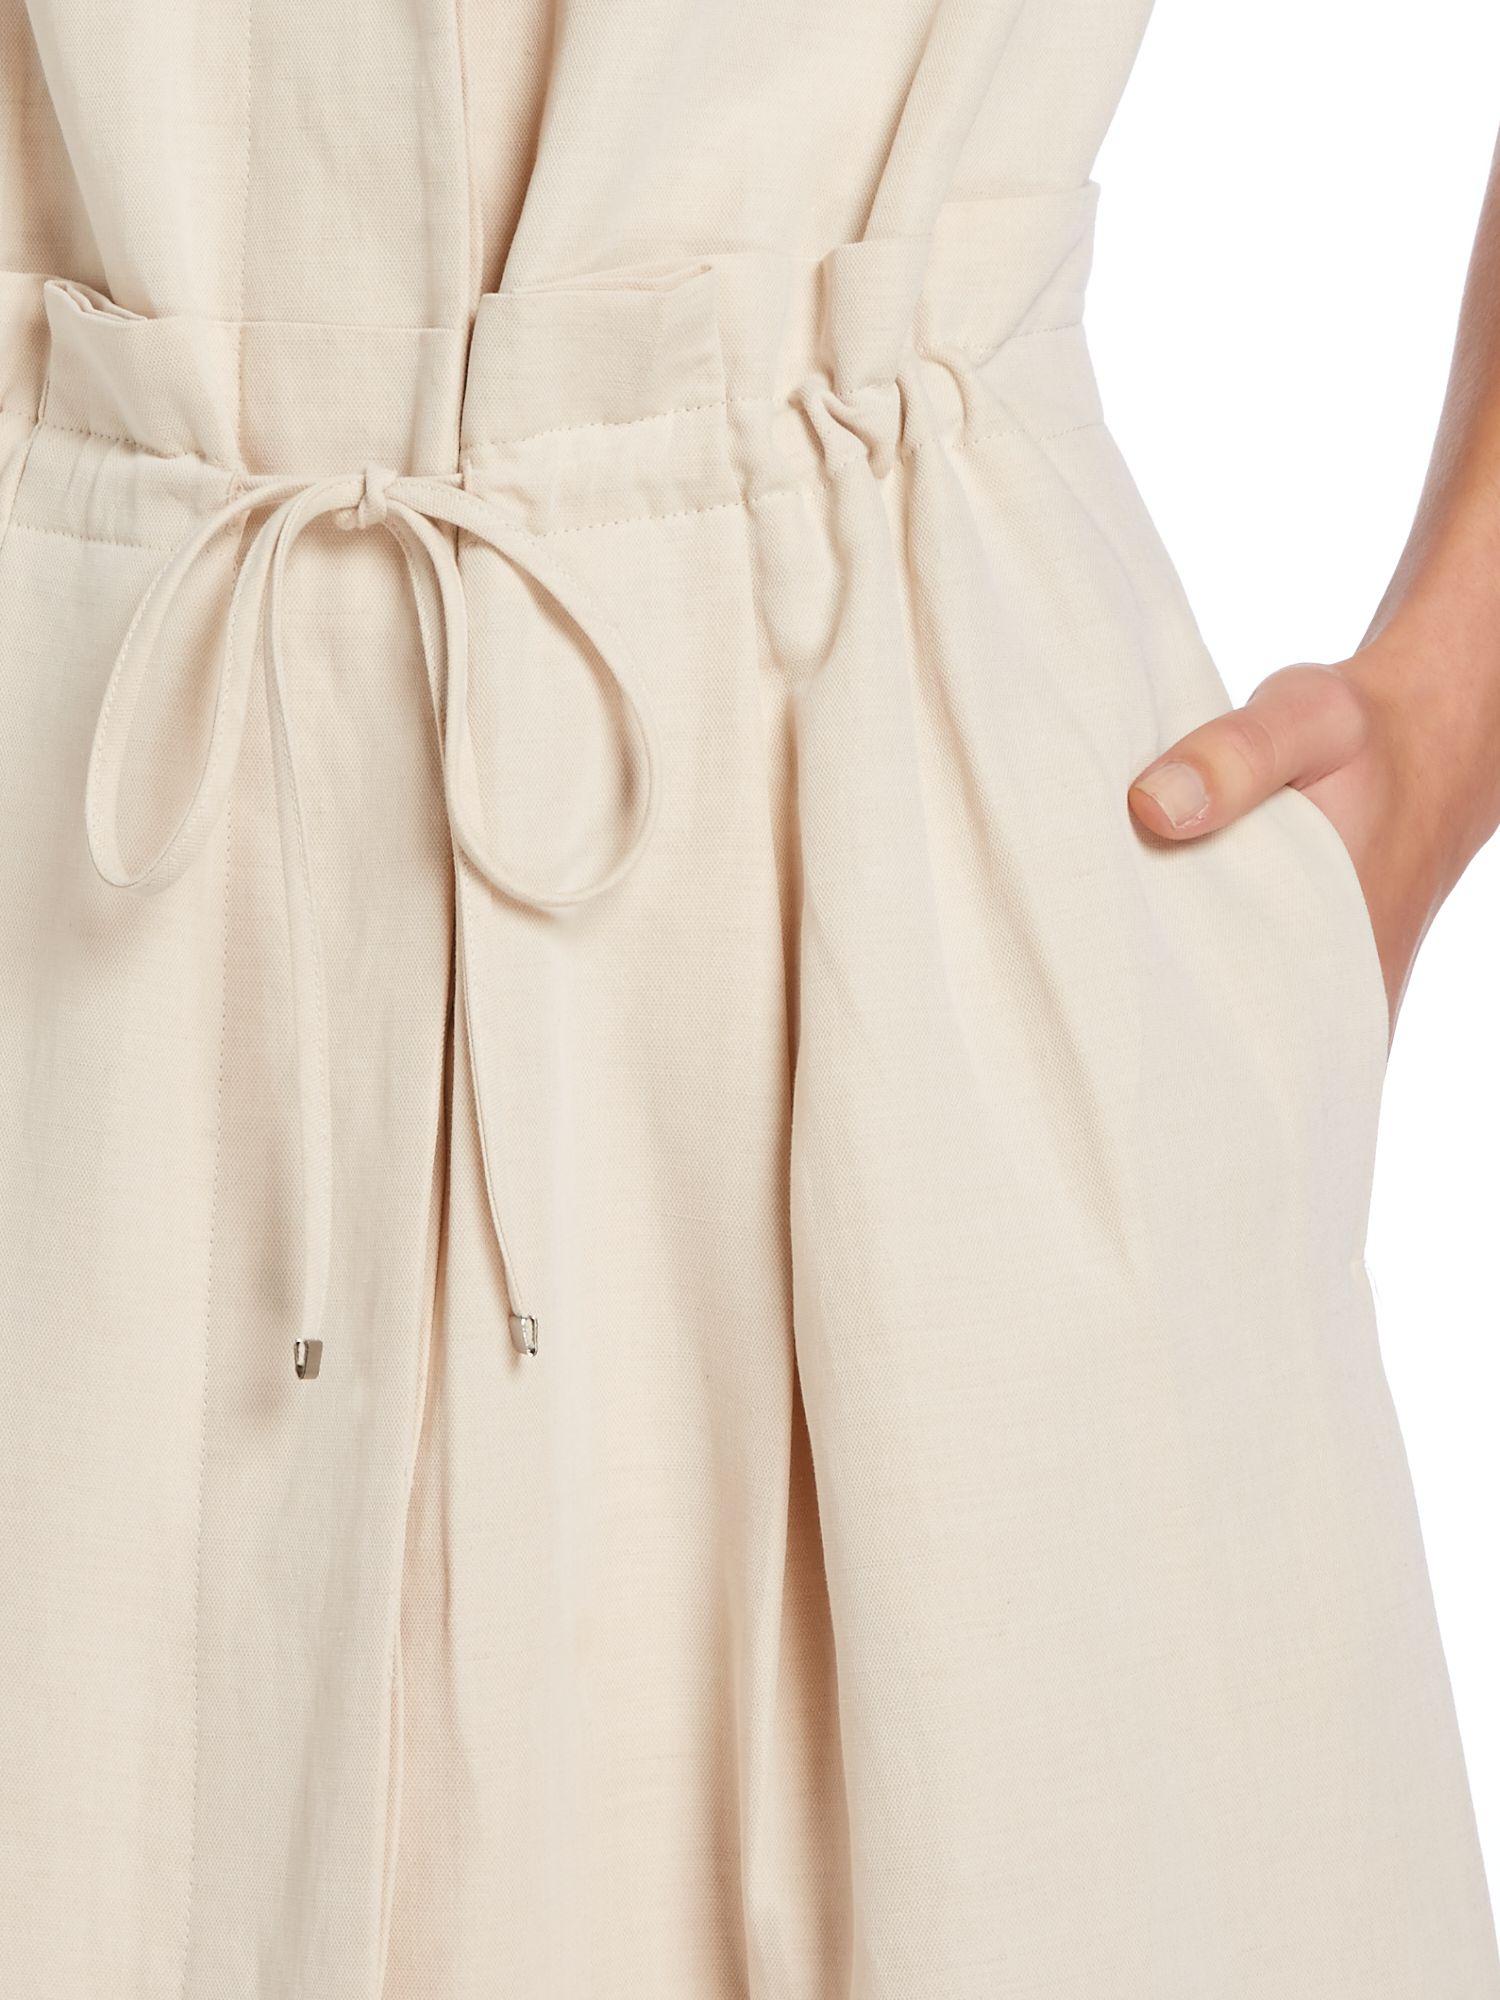 Max Mara Fabio Linen Shirt Dress In White Lyst